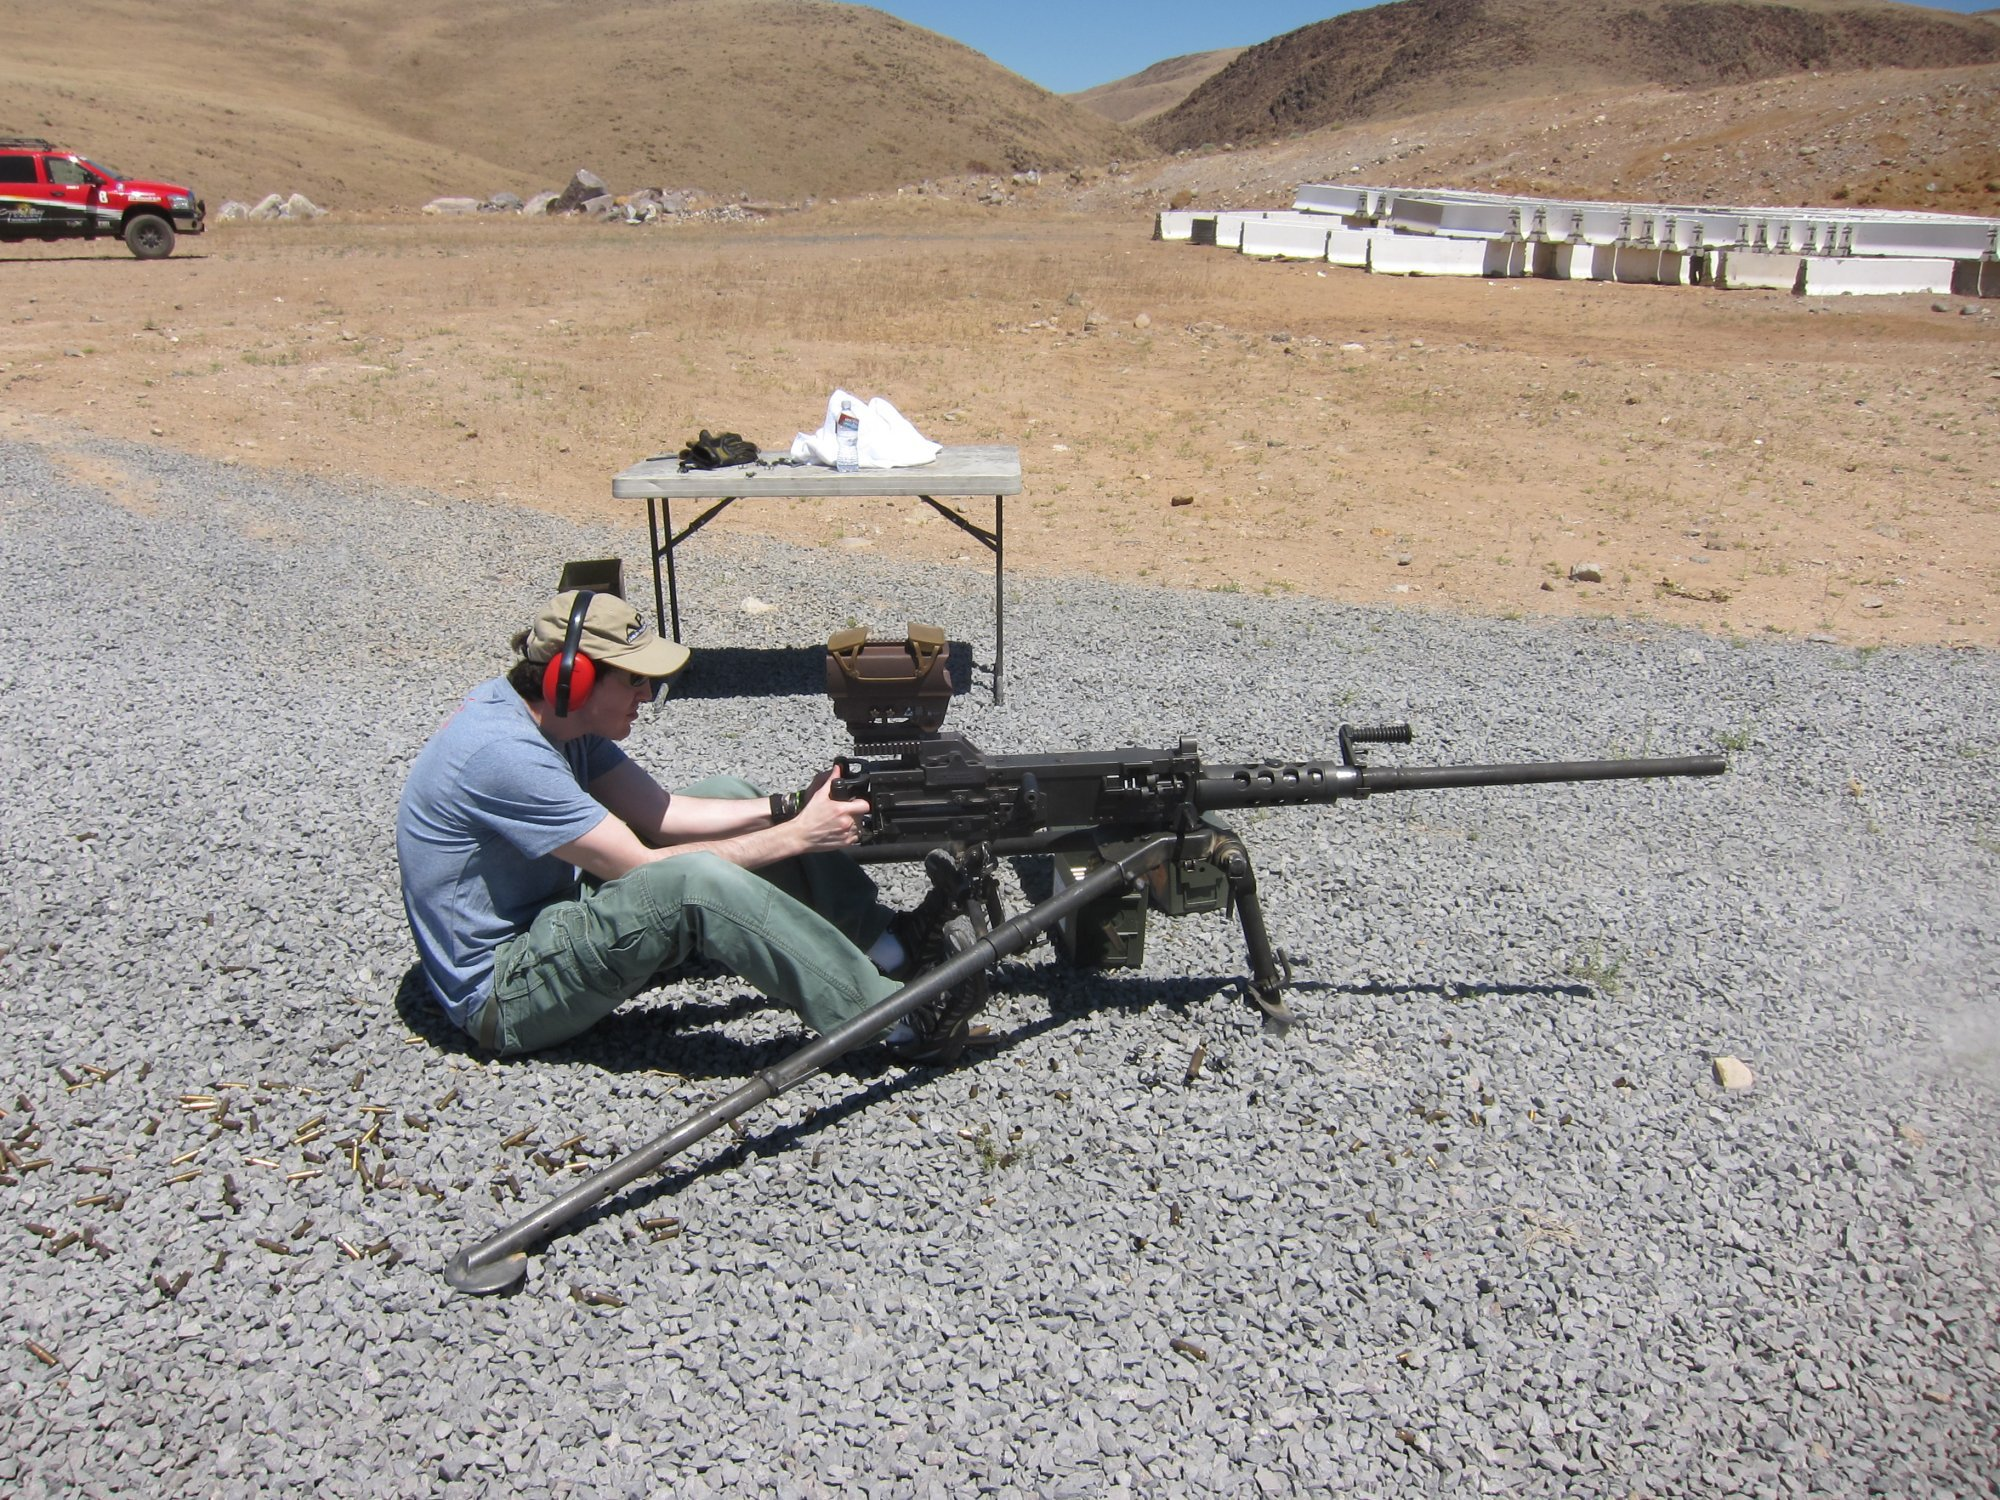 U.S. Ordnance M2HB QCB .50 BMG Heavy Machine Gun HMG David Crane Firing at Range DefenseReview.com DR 1 <!  :en  >U.S. Ordnance M2HB QCB (Quick Change Barrel) Ma Deuce .50 BMG Heavy Machine Gun (HMG) Equipped with Raytheon ELCAN SpecterHR Wide View Dual Red Dot Optical Gunsight Gets Test Fired at the Range (Video!)<!  :  >